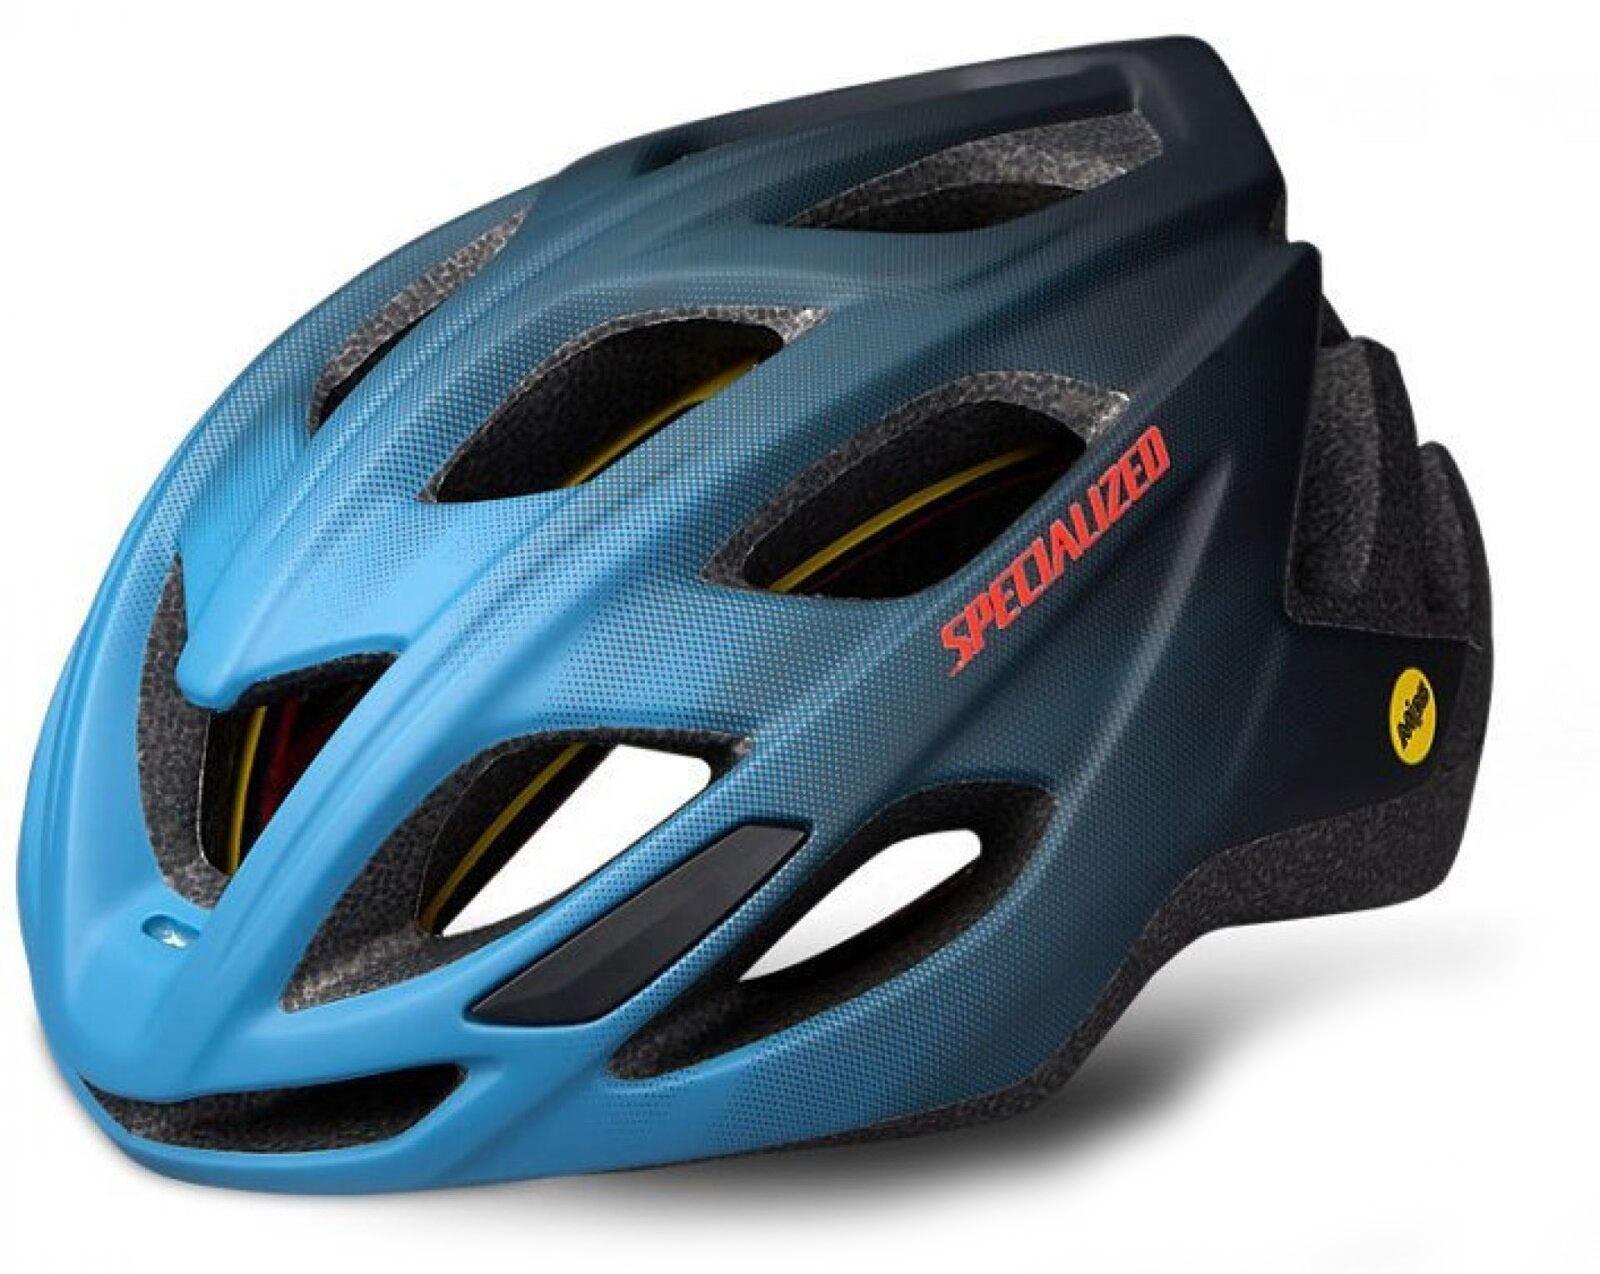 Specialized Chamonix Mips cykelhjelm - Blå  »  Helmet Size: MED/LG (55cm-59cm)